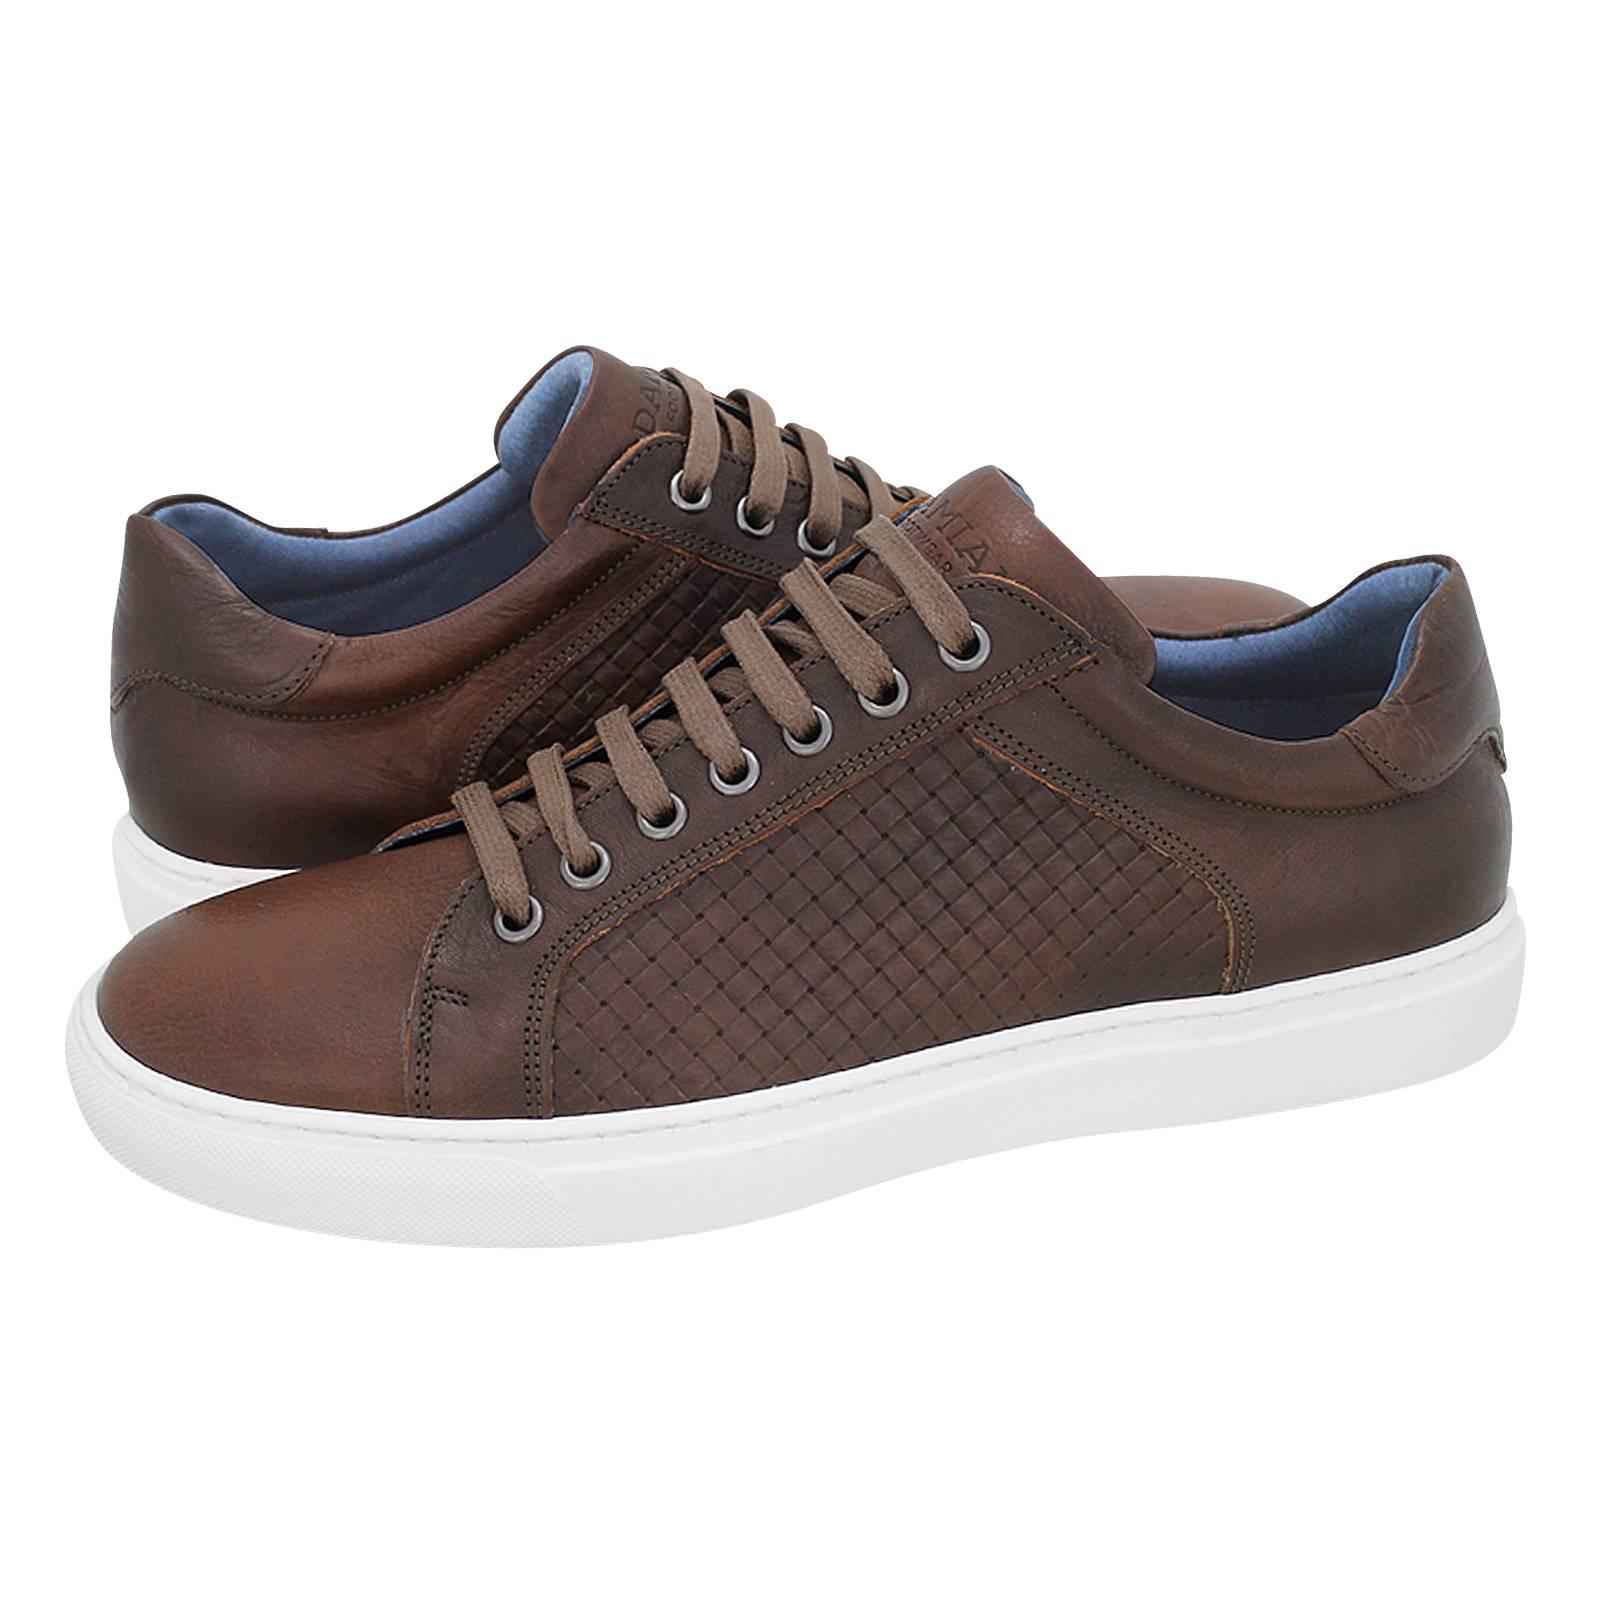 44b4f078798 Παπούτσια casual Damiani Chalouze